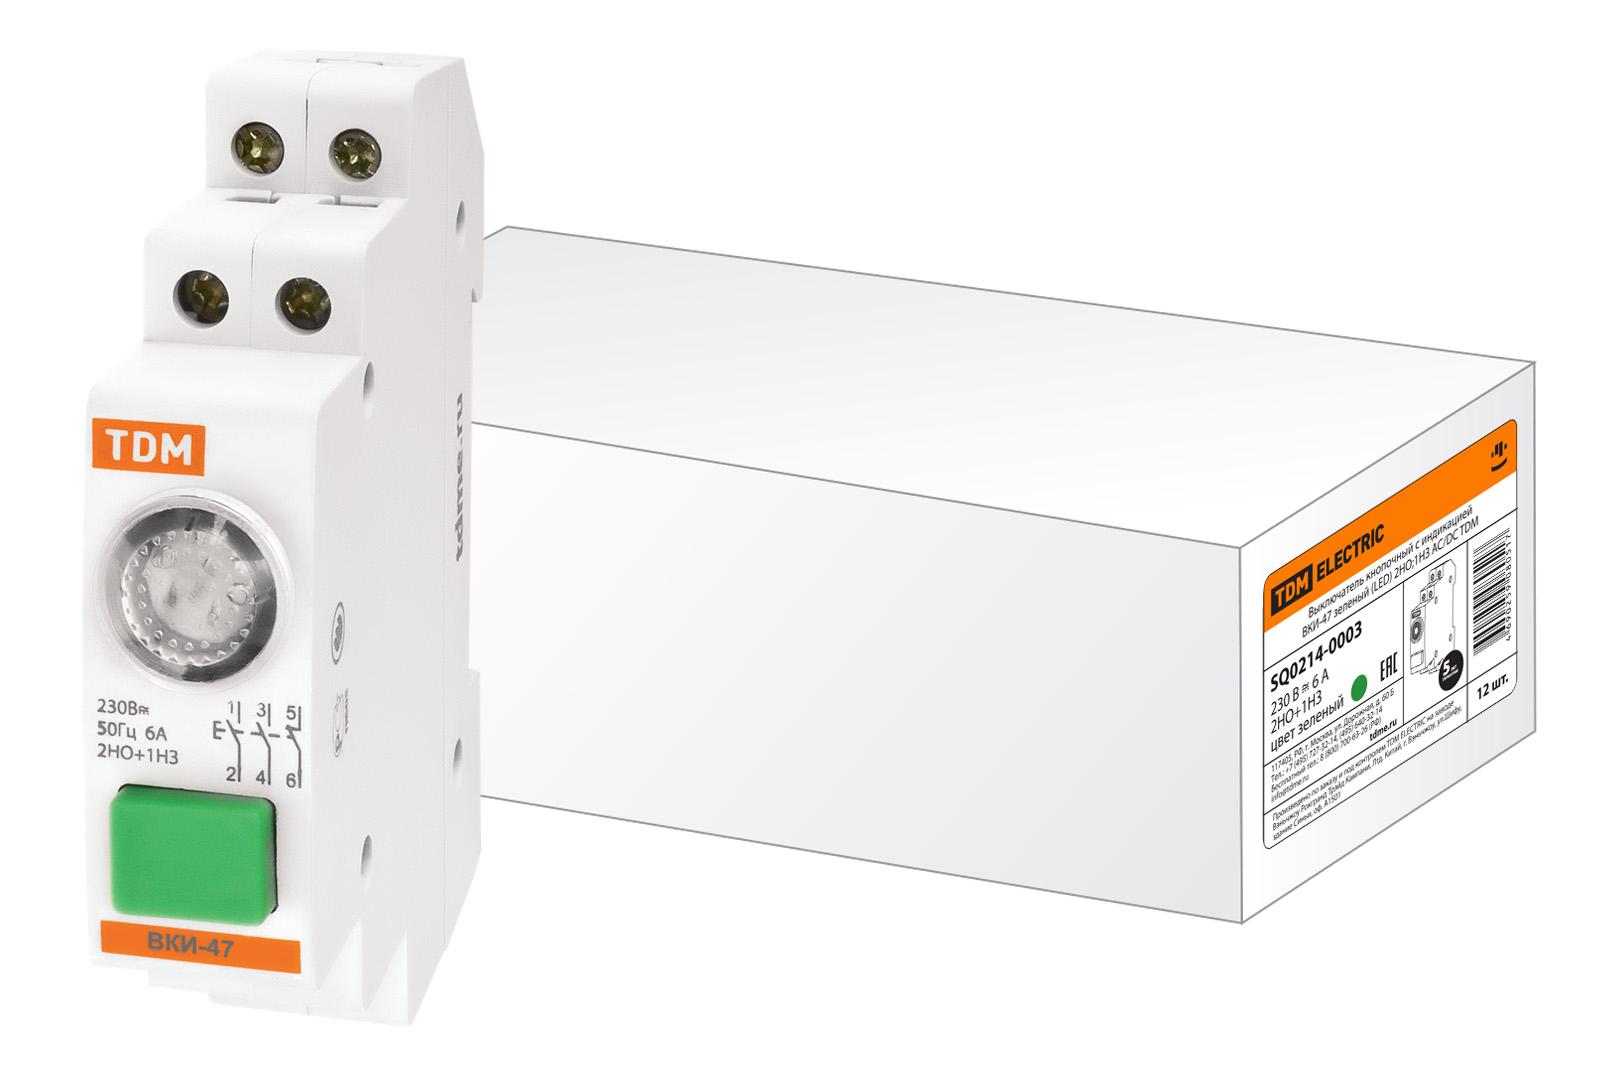 Выключатель Tdm Sq0214-0003 сигнальная лампа зеленая tdm лс 47 led ac dc sq0214 0009